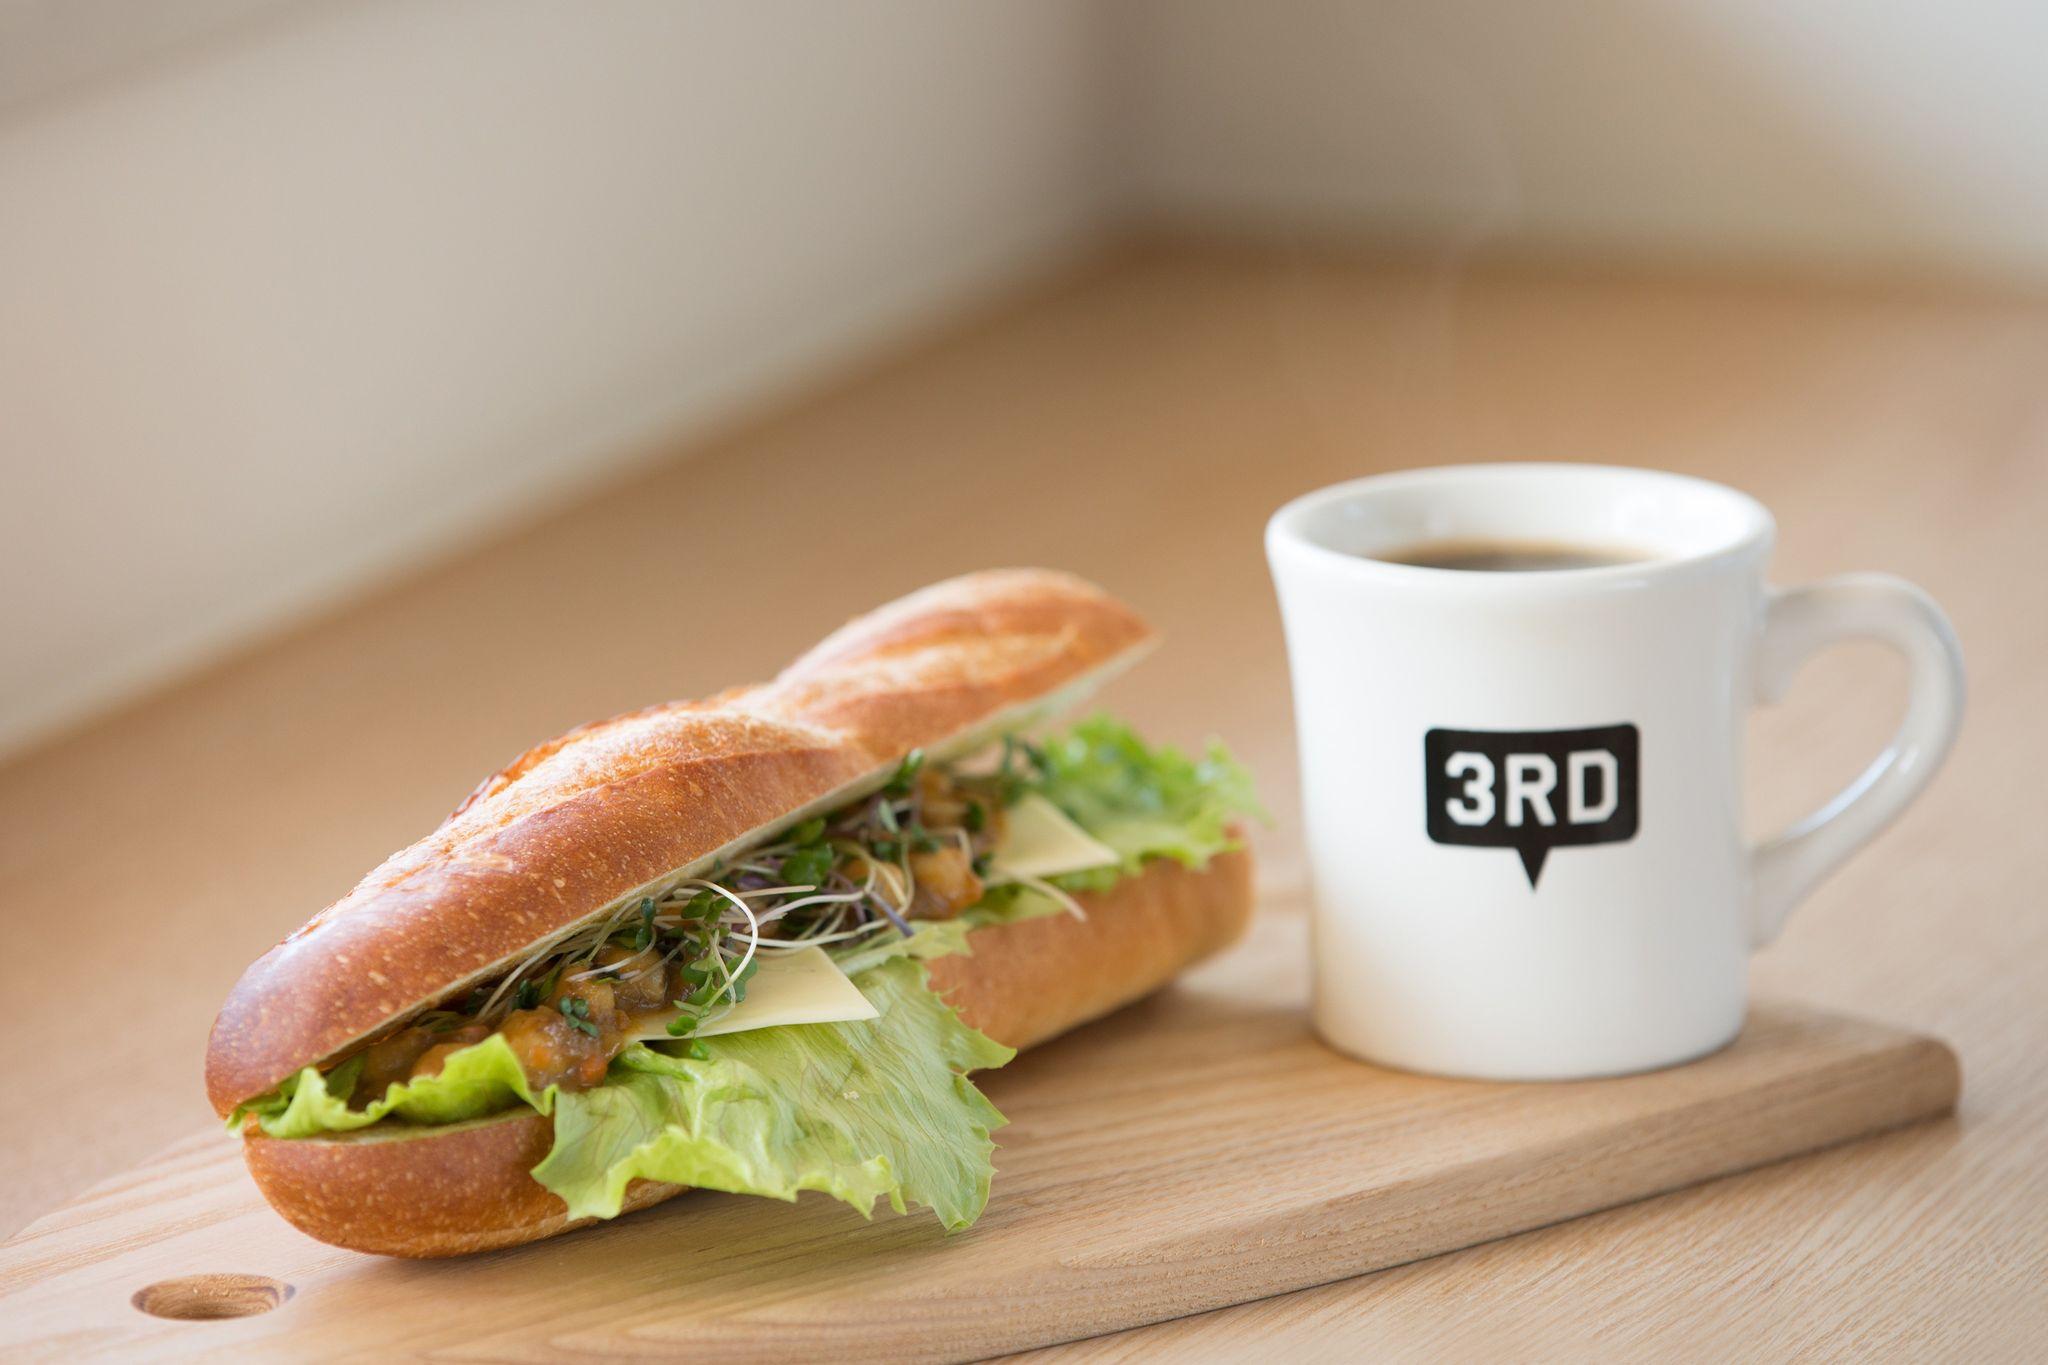 3RDのサンドイッチとコーヒー(提供:3RD CAFE&MORE)